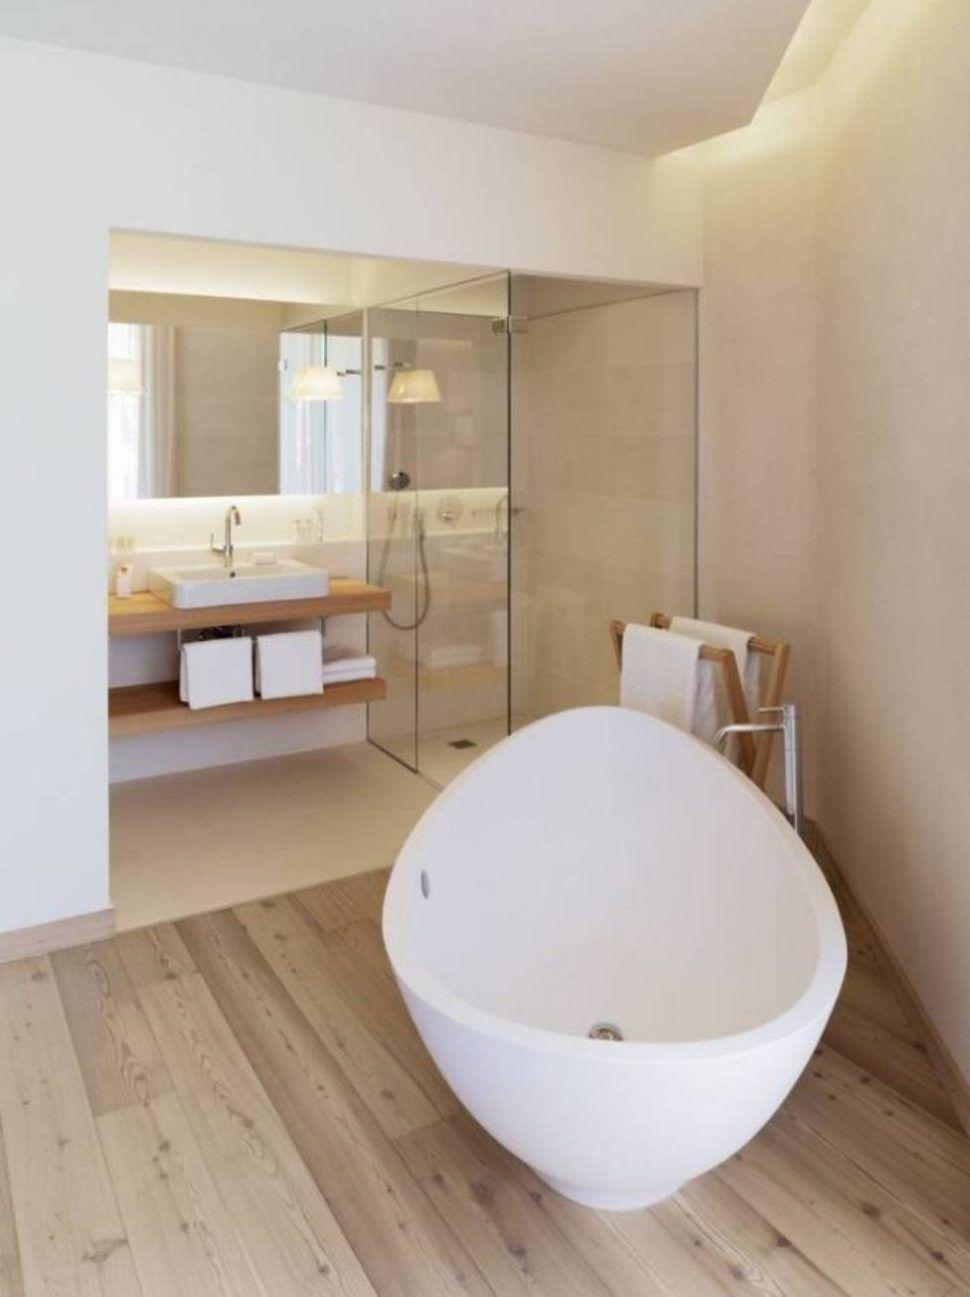 Sleek Bathroom Design Bathroommodern Rustic Bathroom Designing Idea With White Sleek